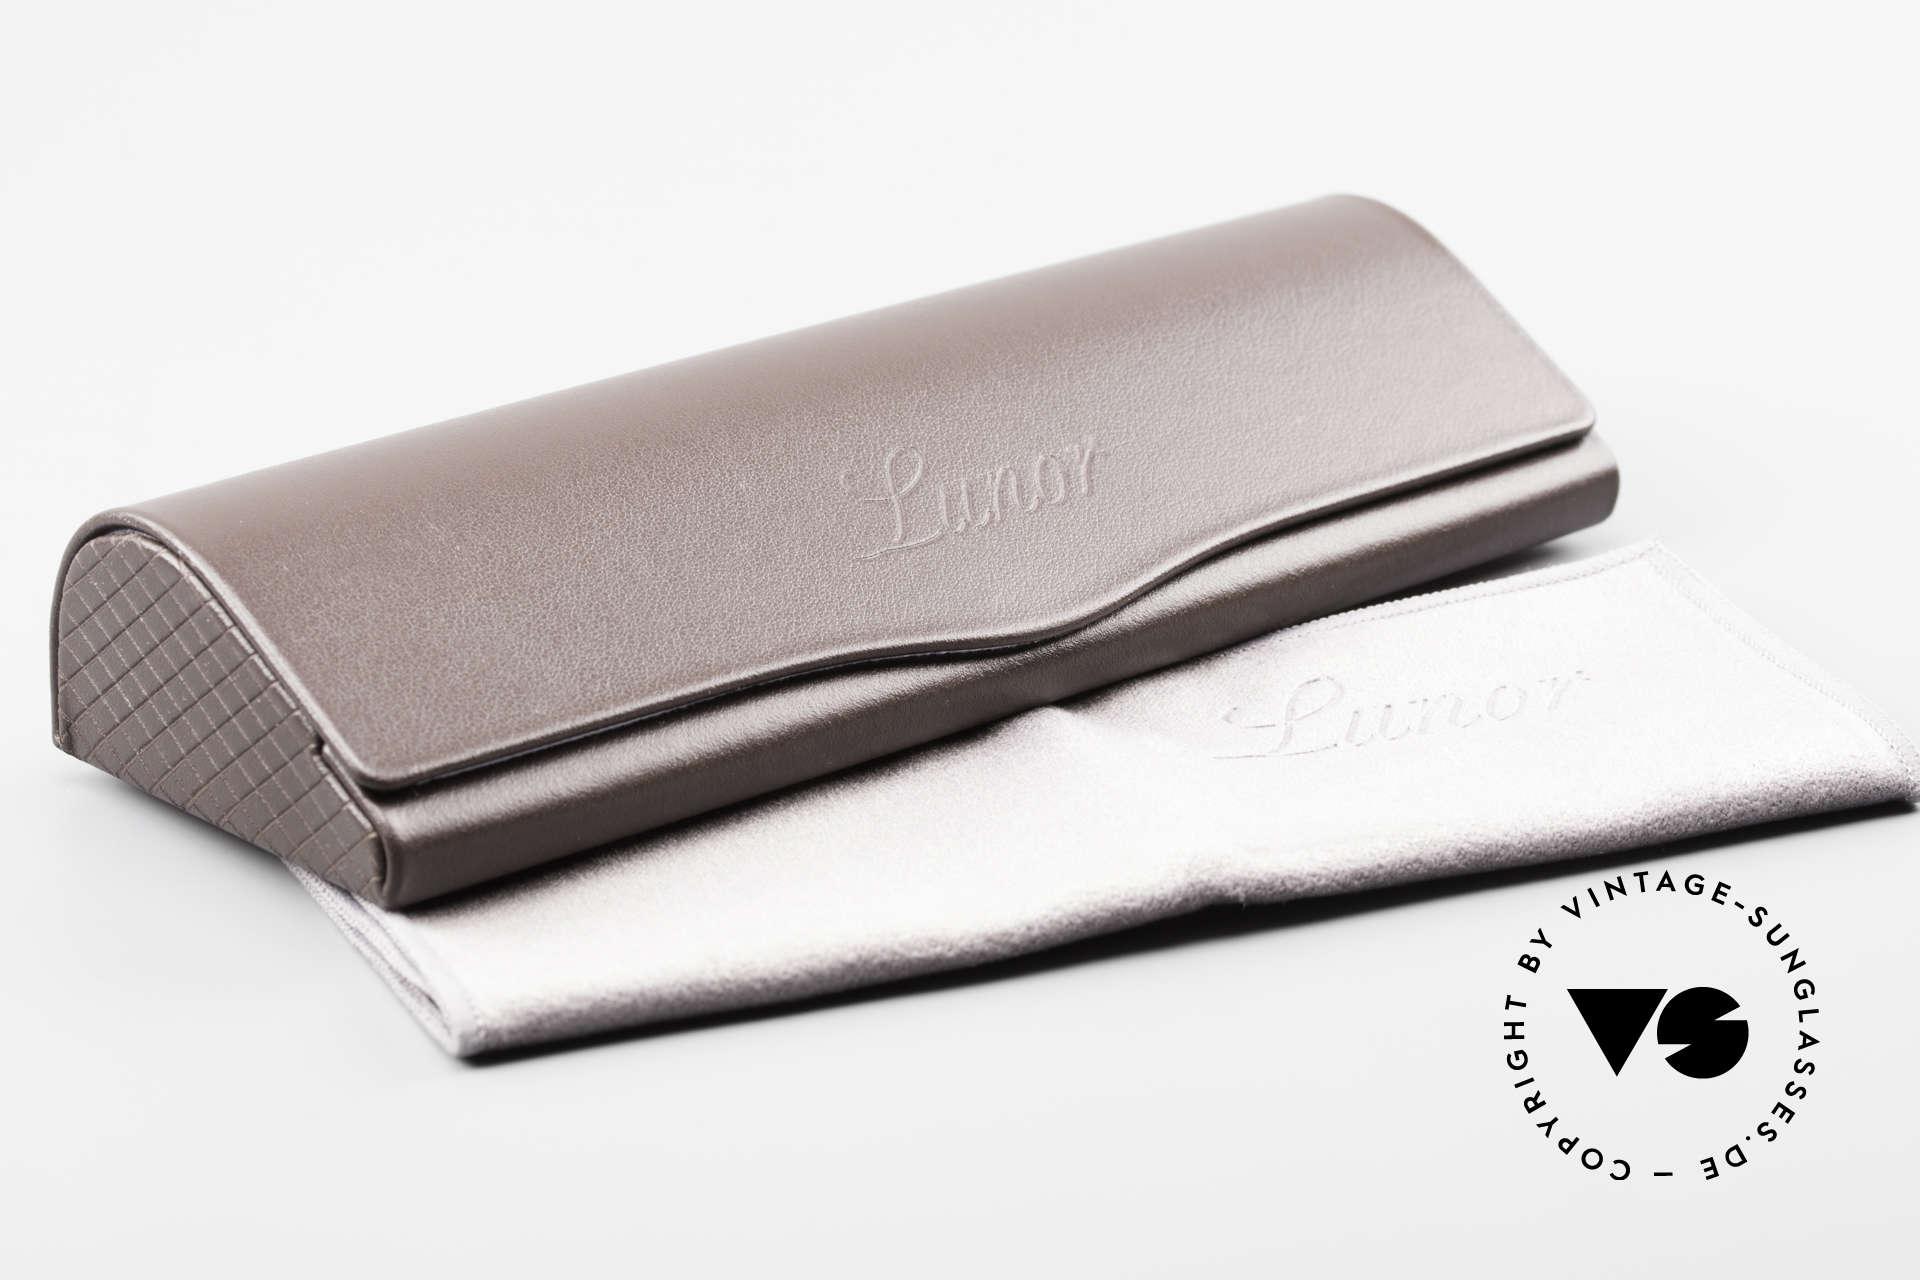 Lunor XA 03 Extraordinary Eyeglass Design, Size: medium, Made for Men and Women